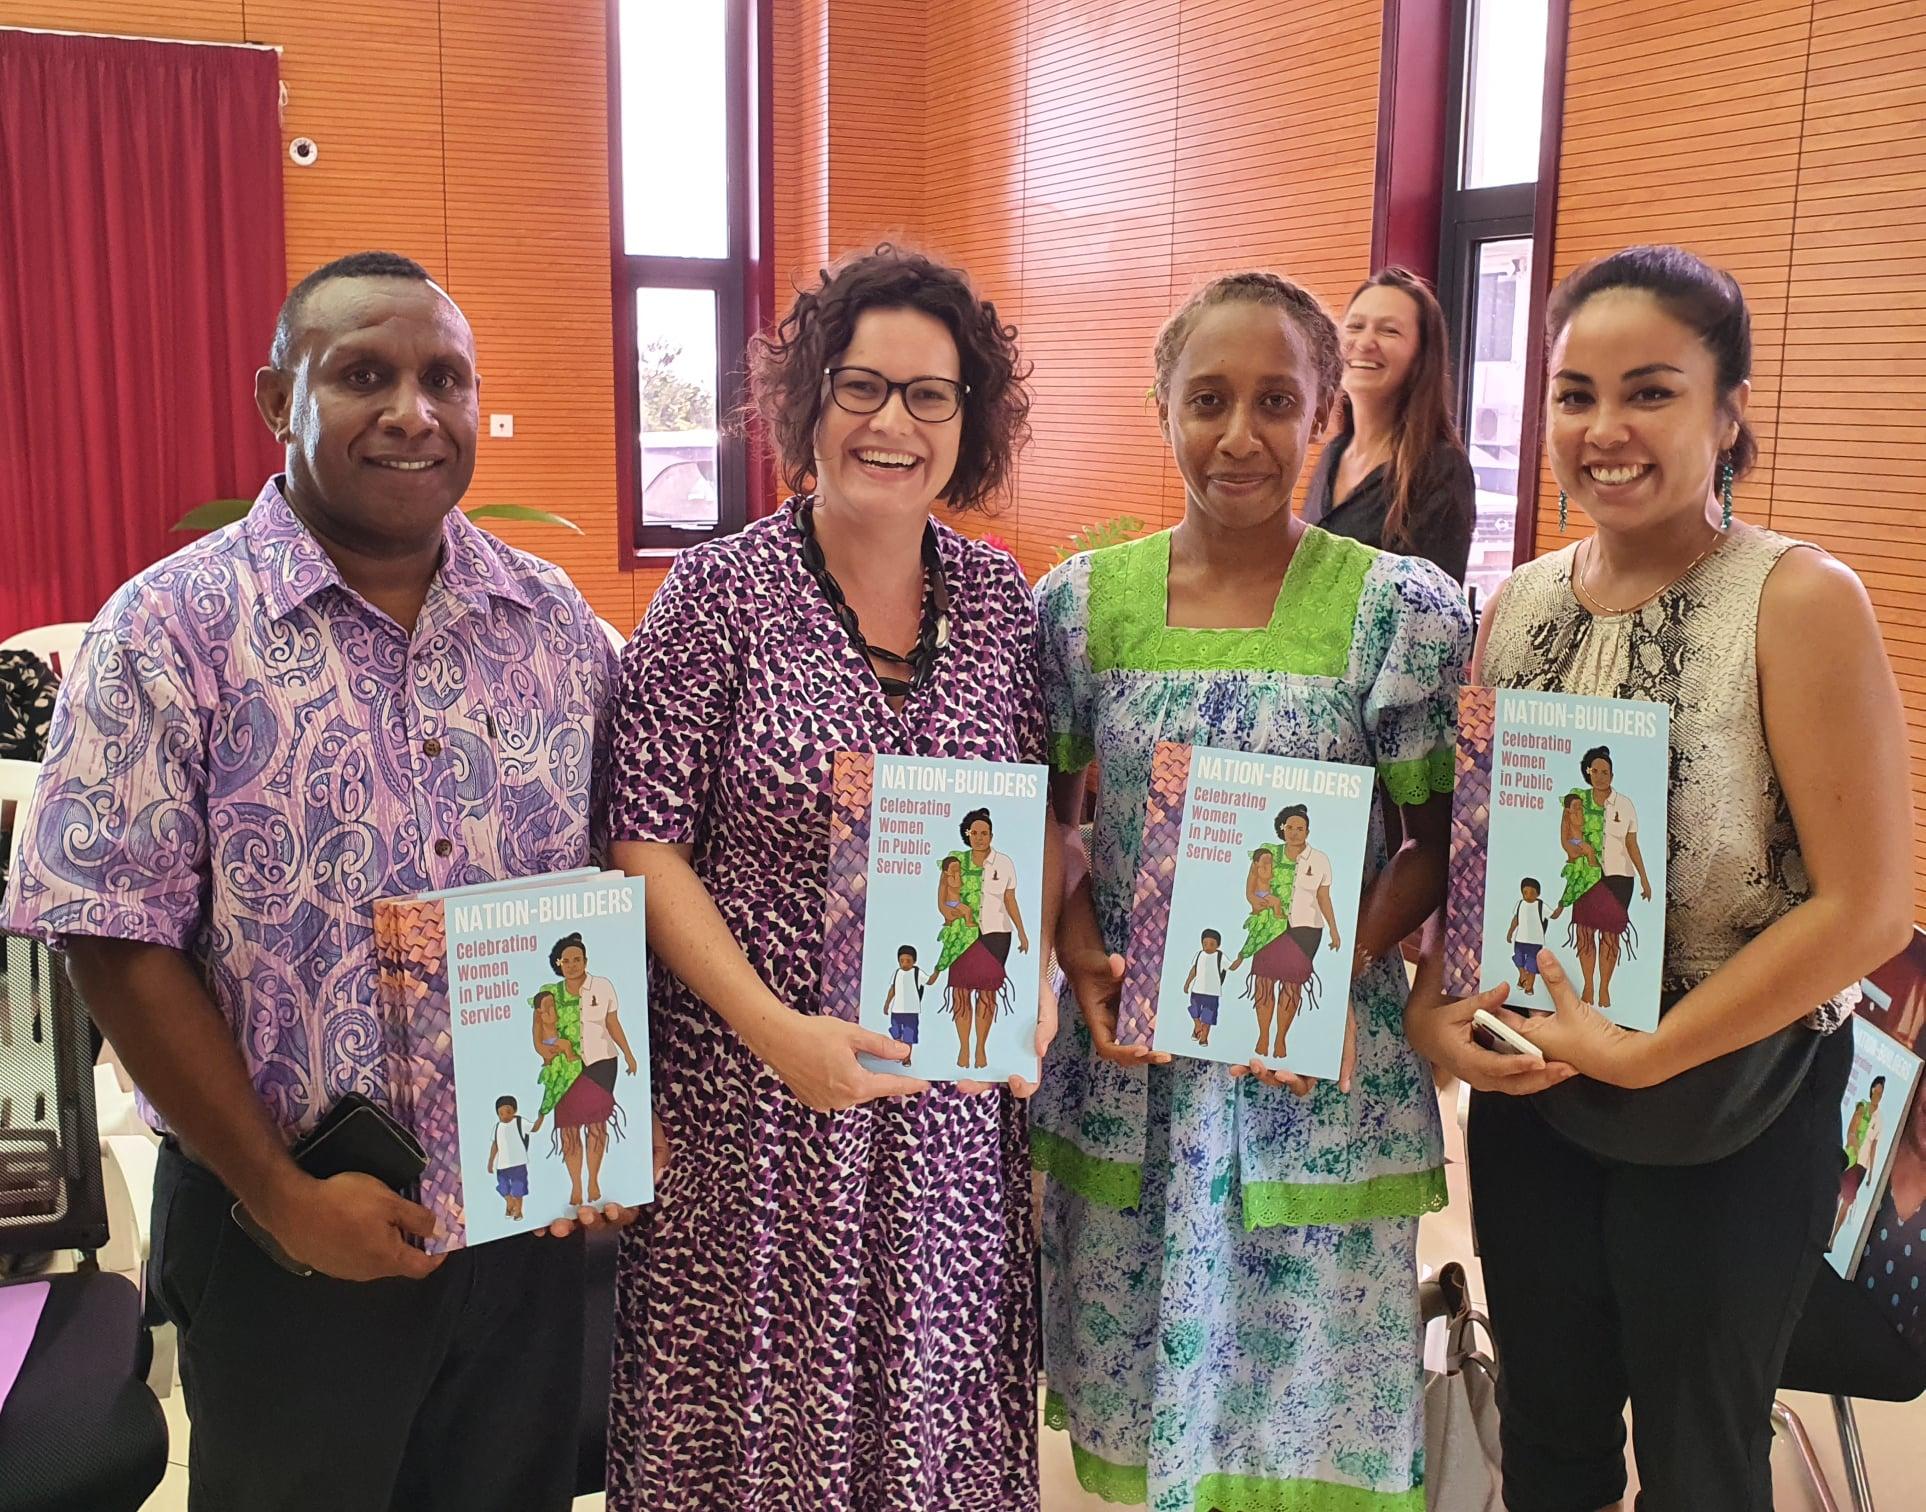 celebrating-women-in-public-service-book-launch